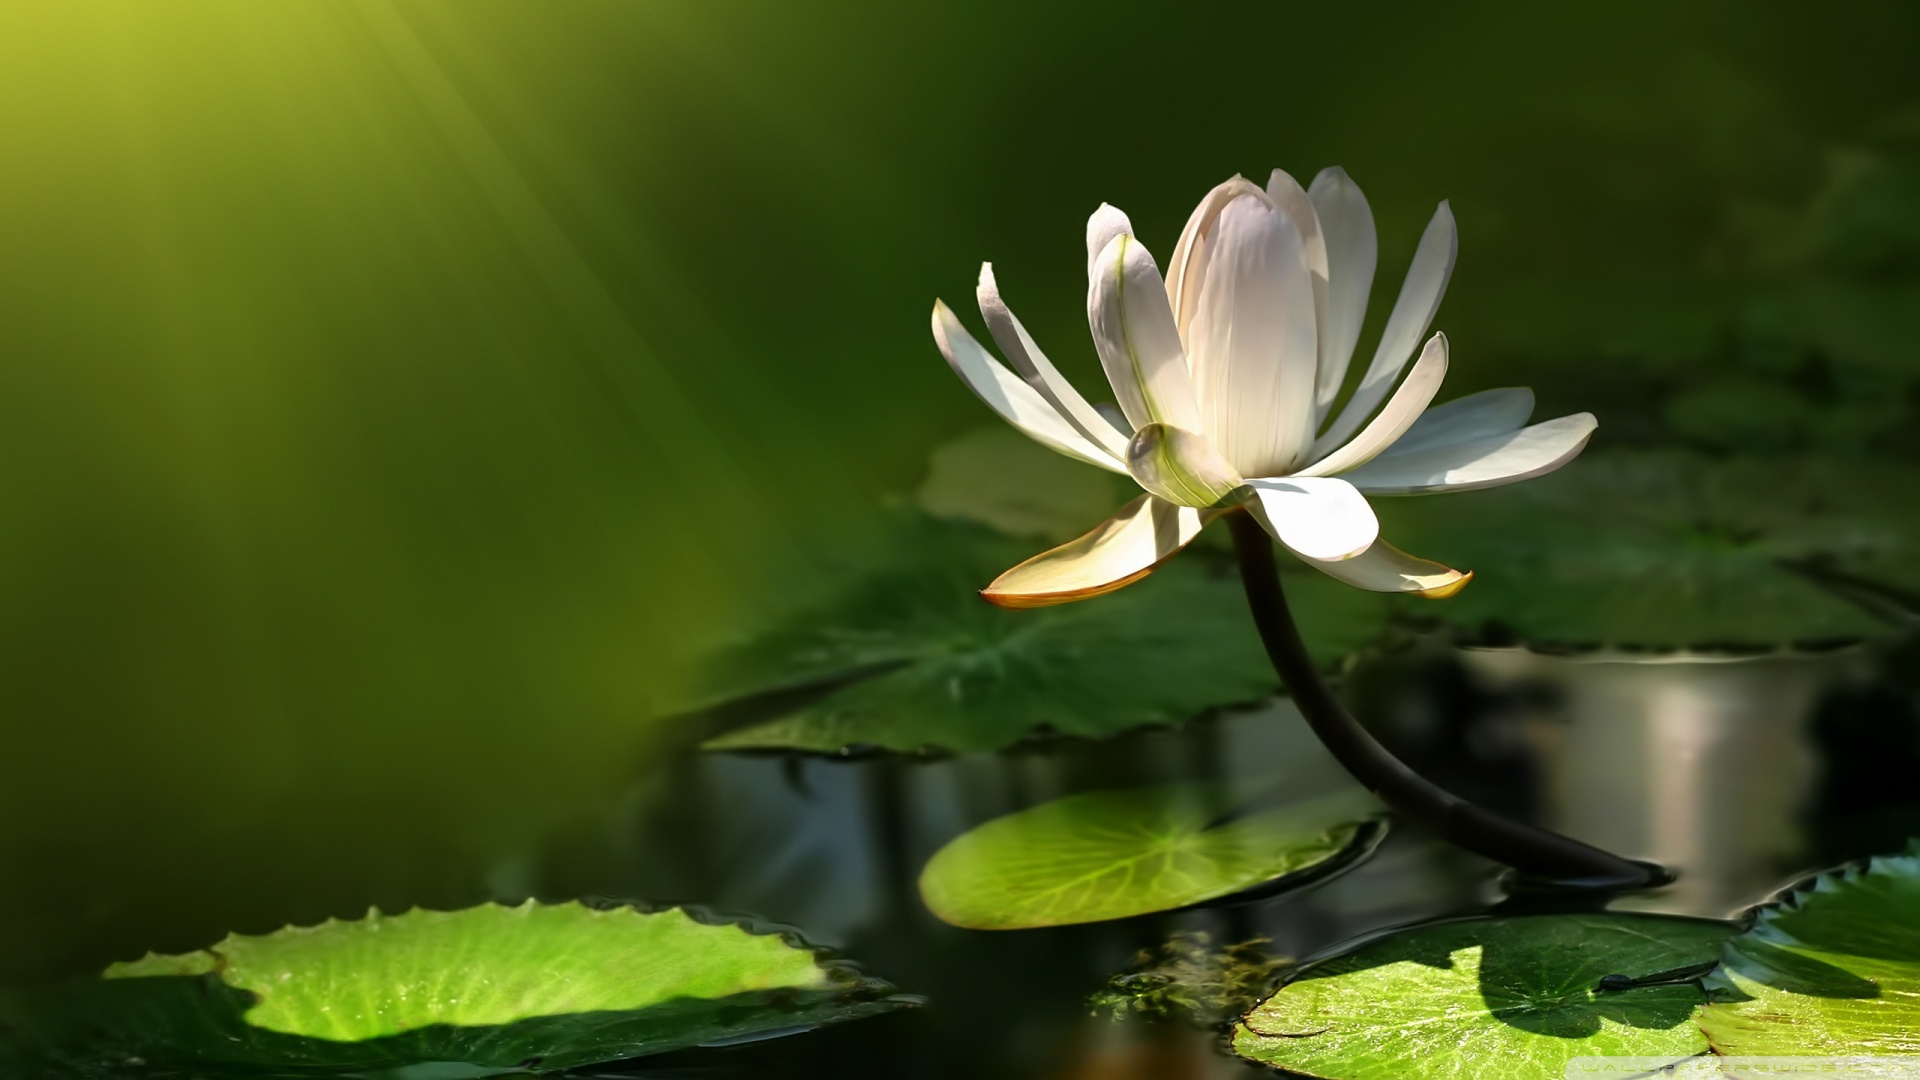 white_lotus_flower-wallpaper-1920x1080